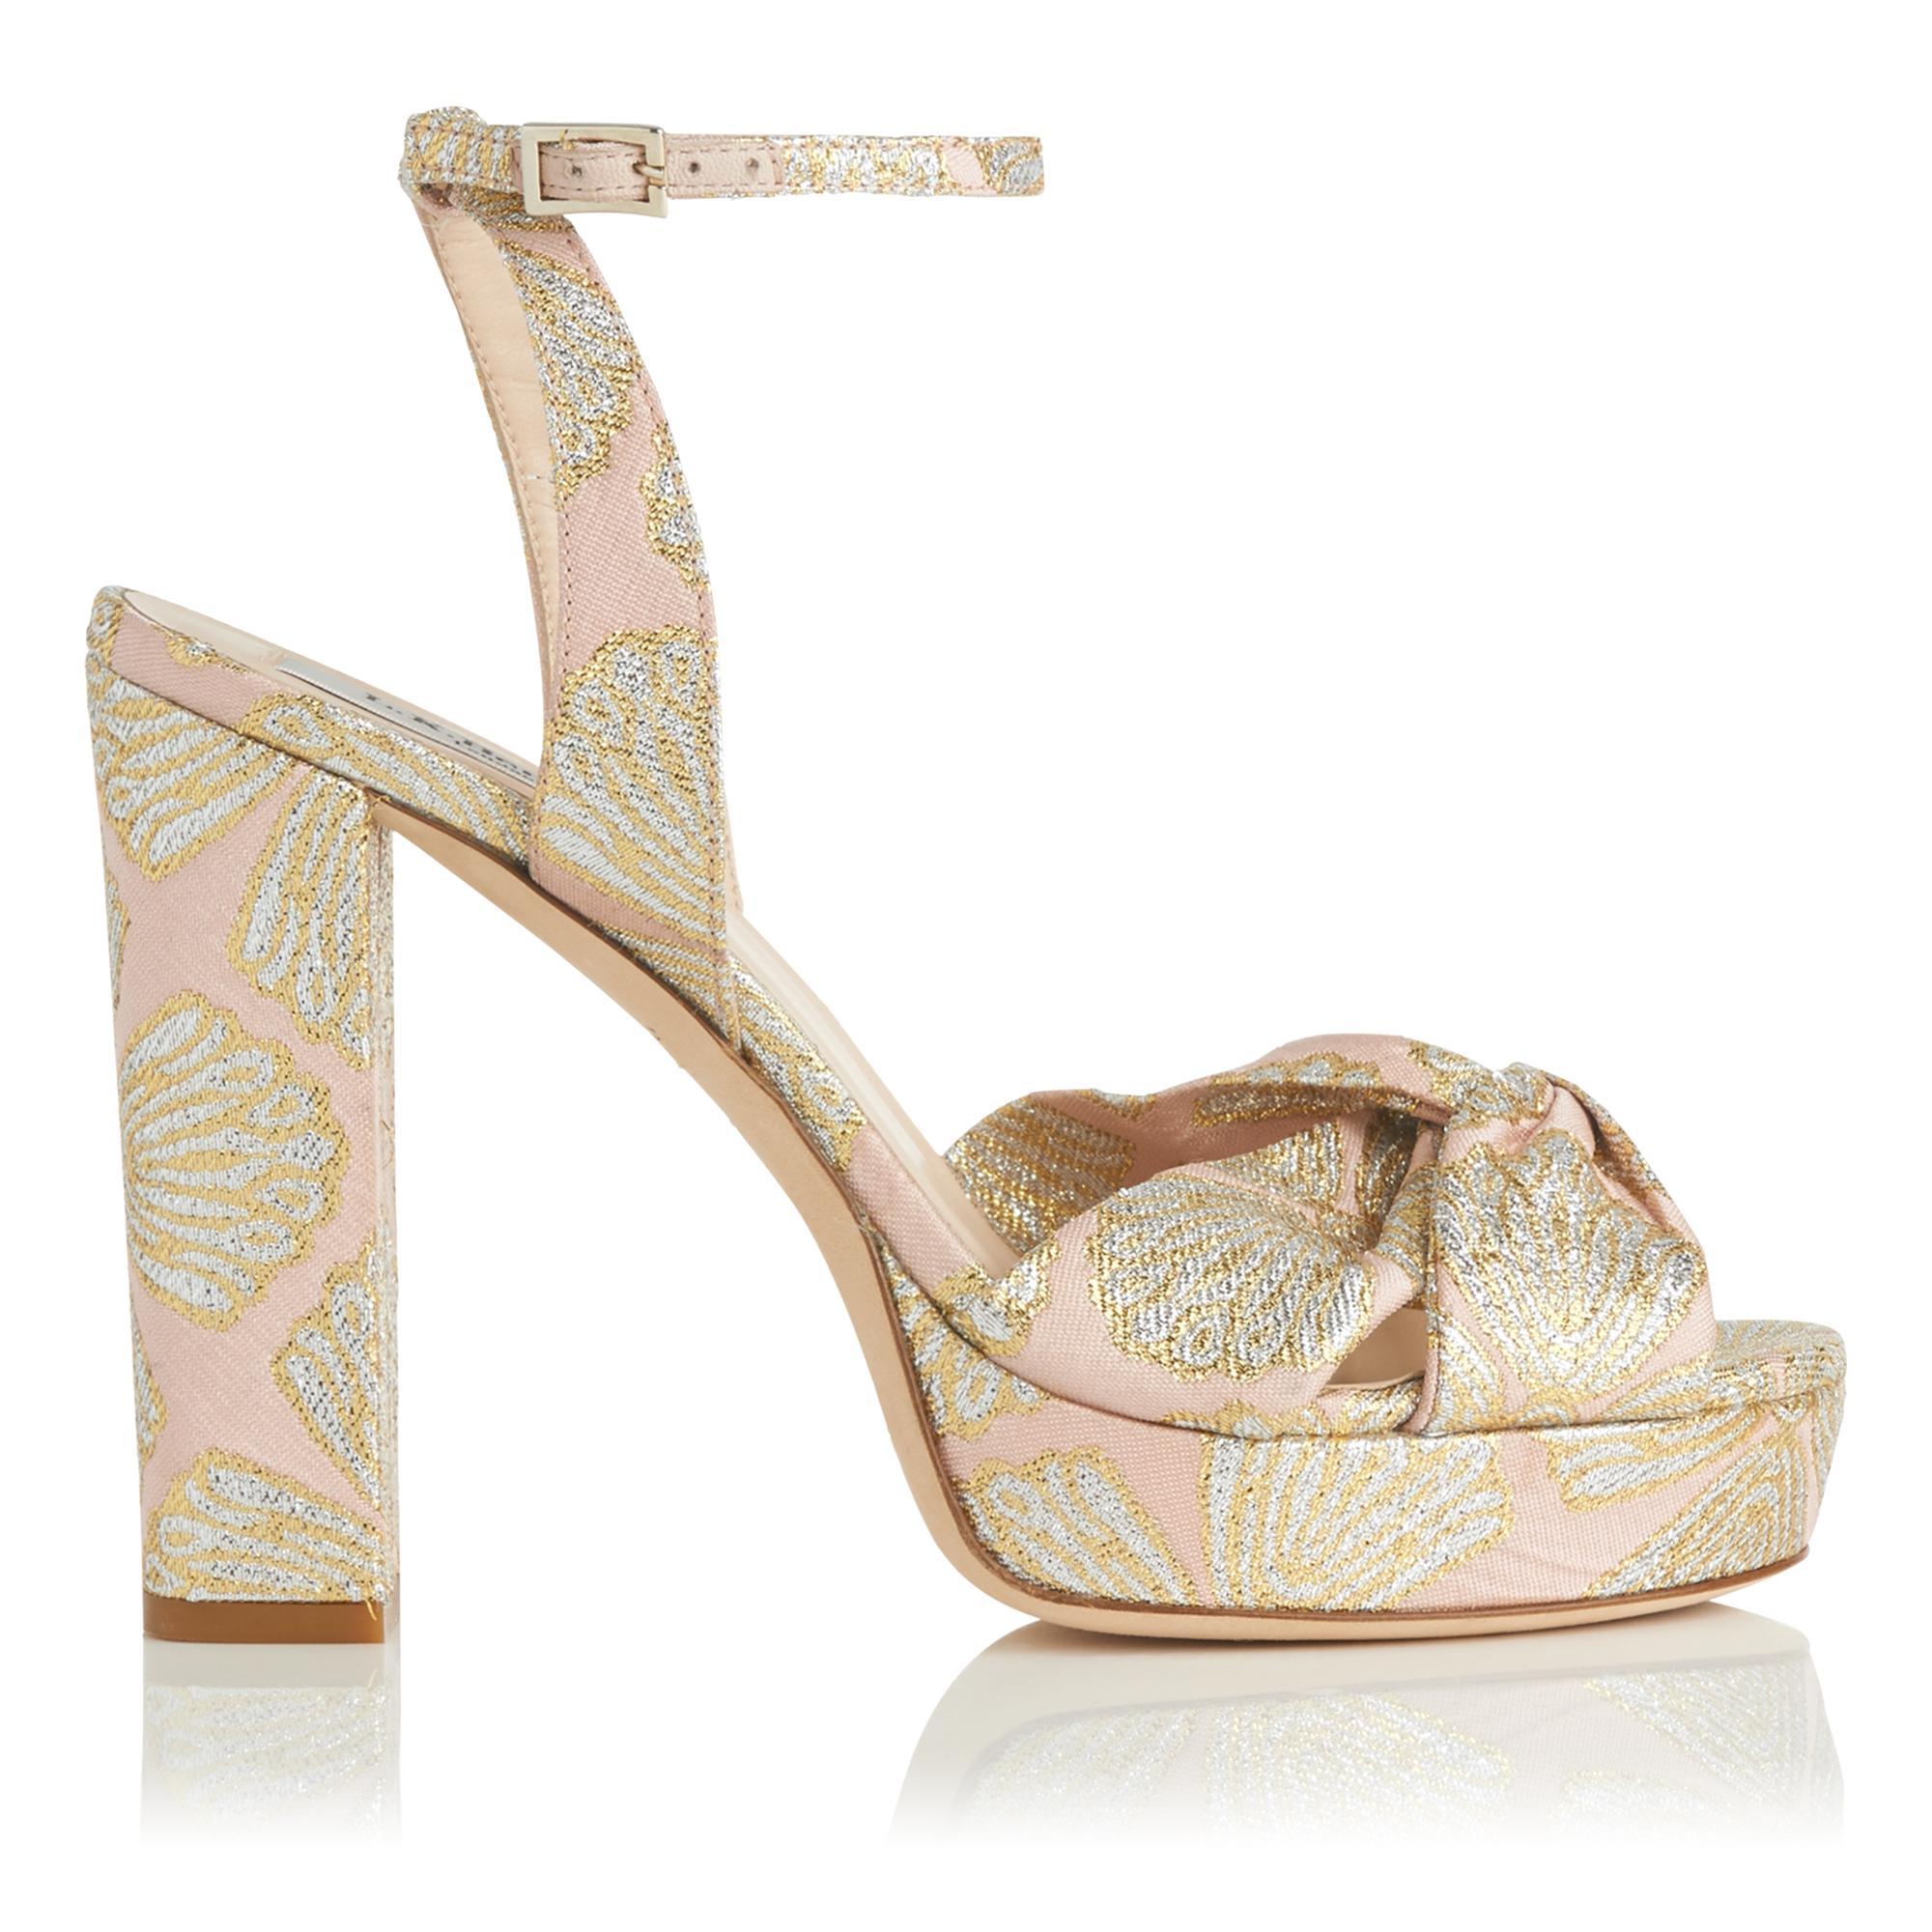 5c813ab906b3ef Annabella Pink Metallic Sandal